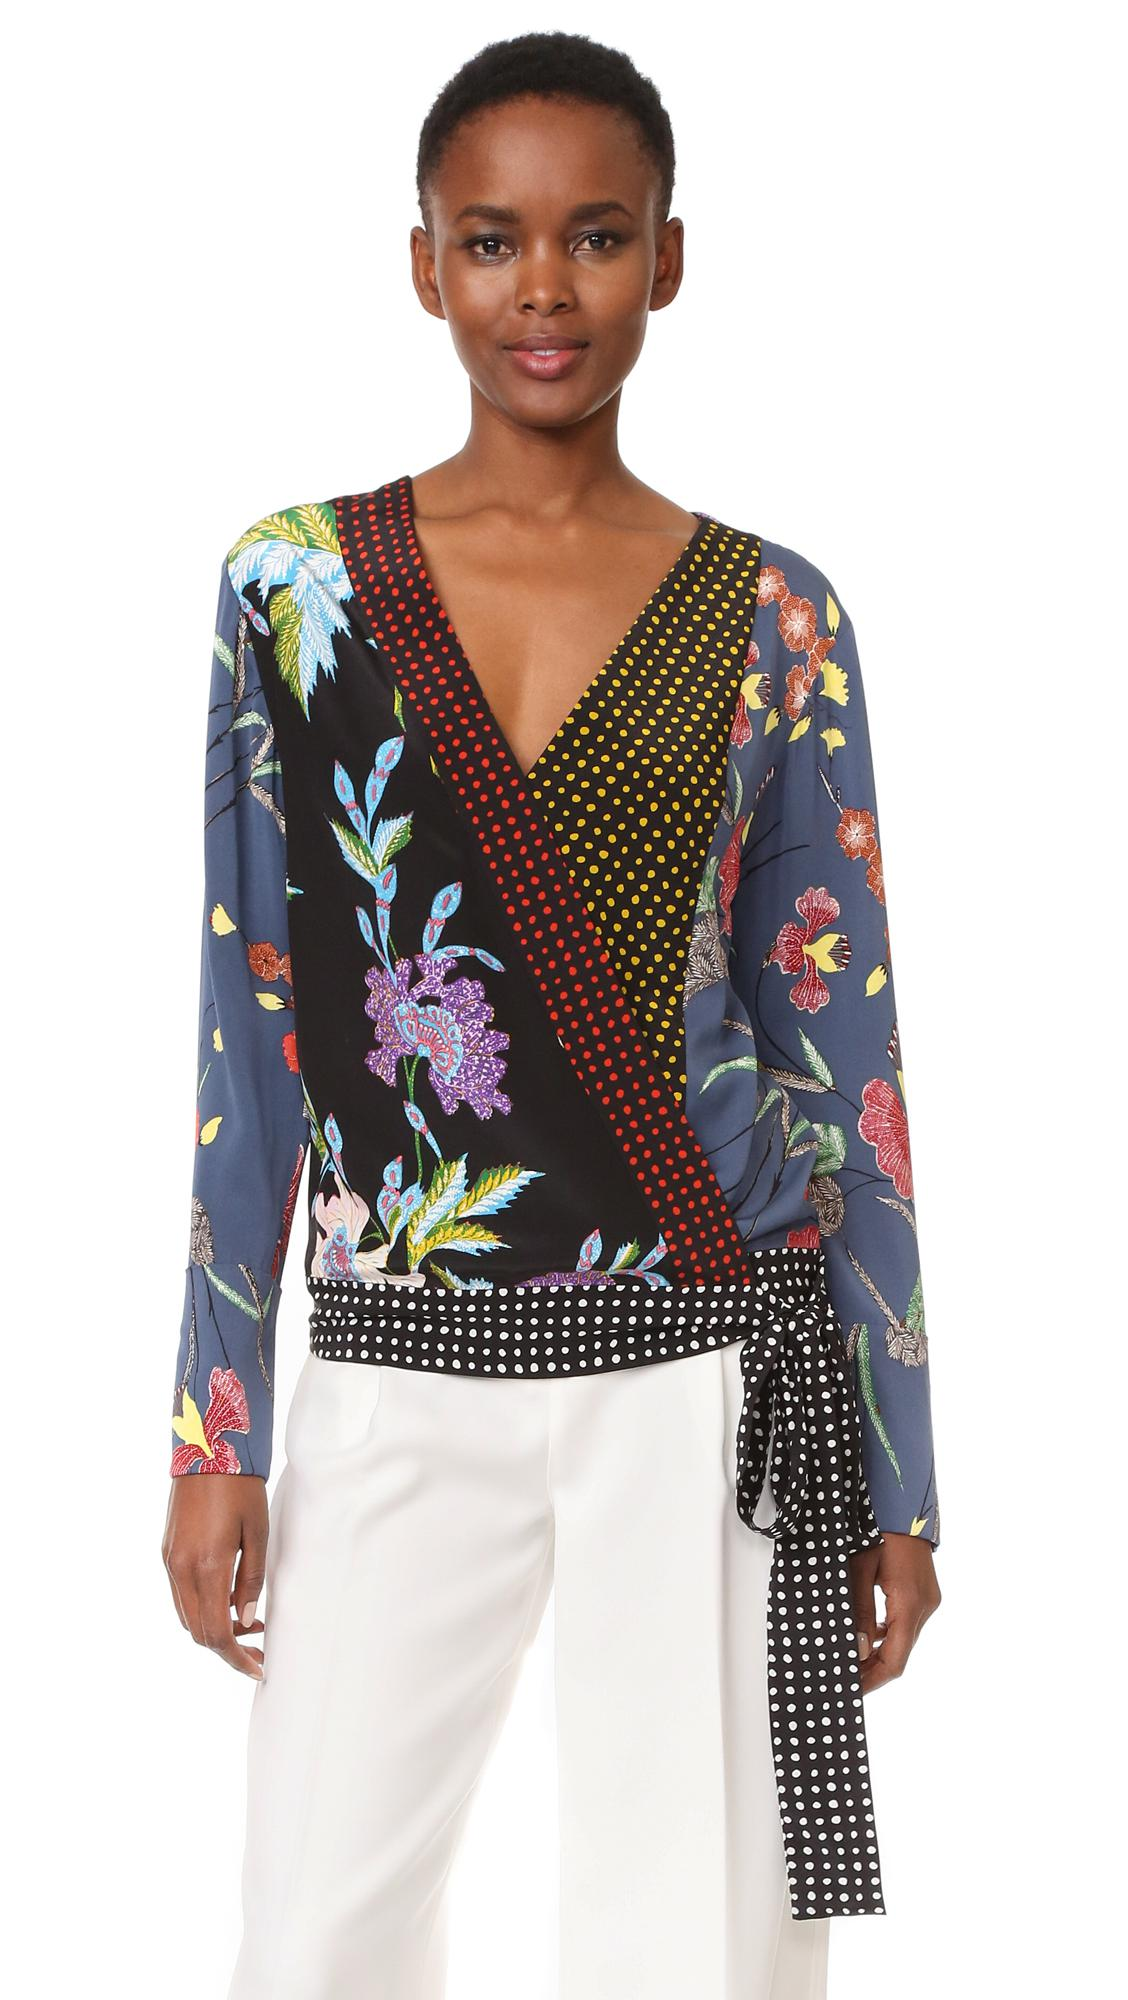 88a67c3722176e Lyst - Diane Von Furstenberg Long Sleeve Crossover Blouse